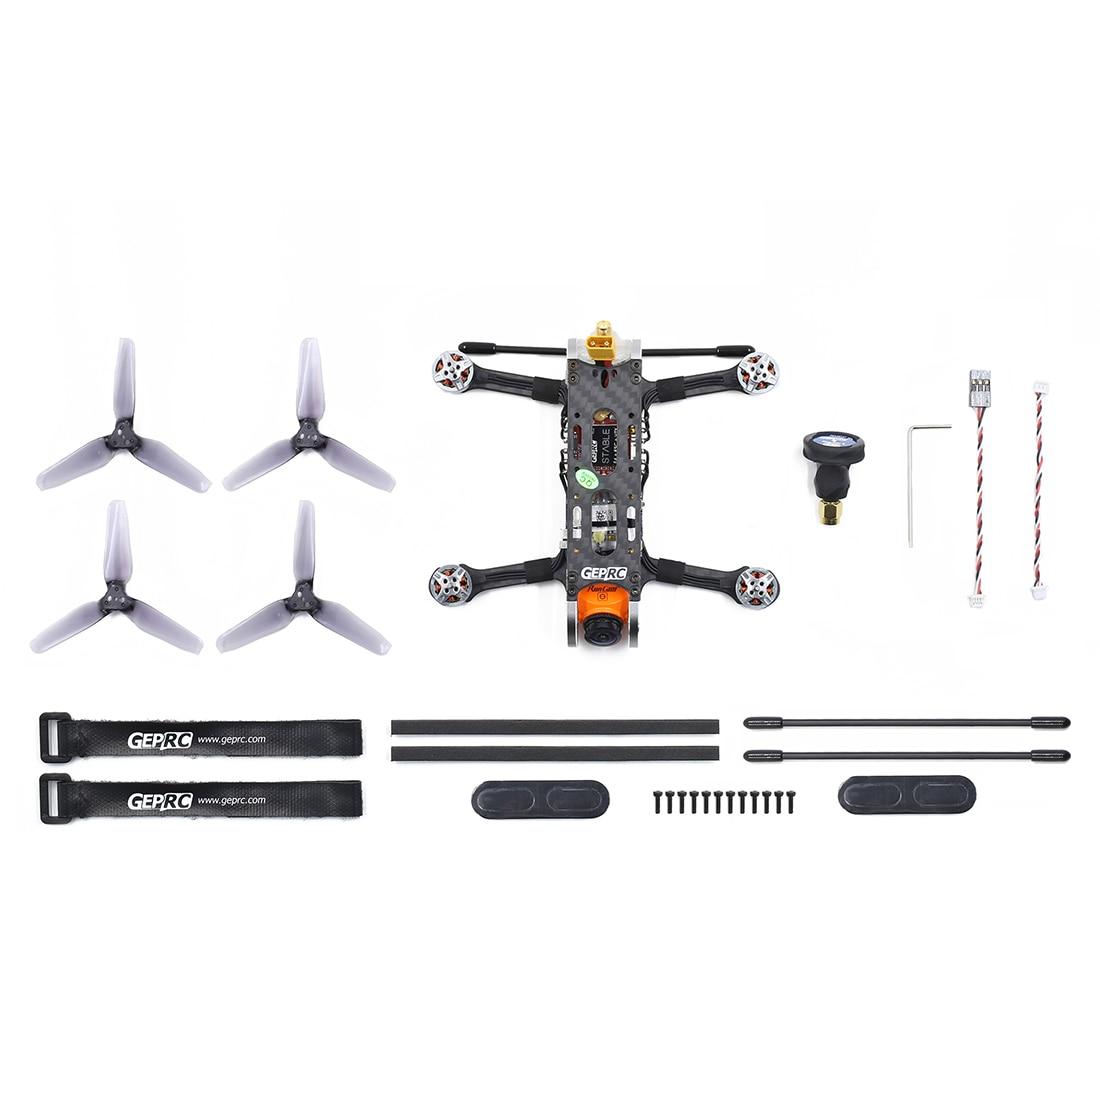 GEPRC GEP CX Cygnet 145mm 3 Inch Stable F4 20A 48CH RunCam Split Mini 2 1080P HD Camera 4500kv Motor RC FPV Racing Drone BNF PNP - 6